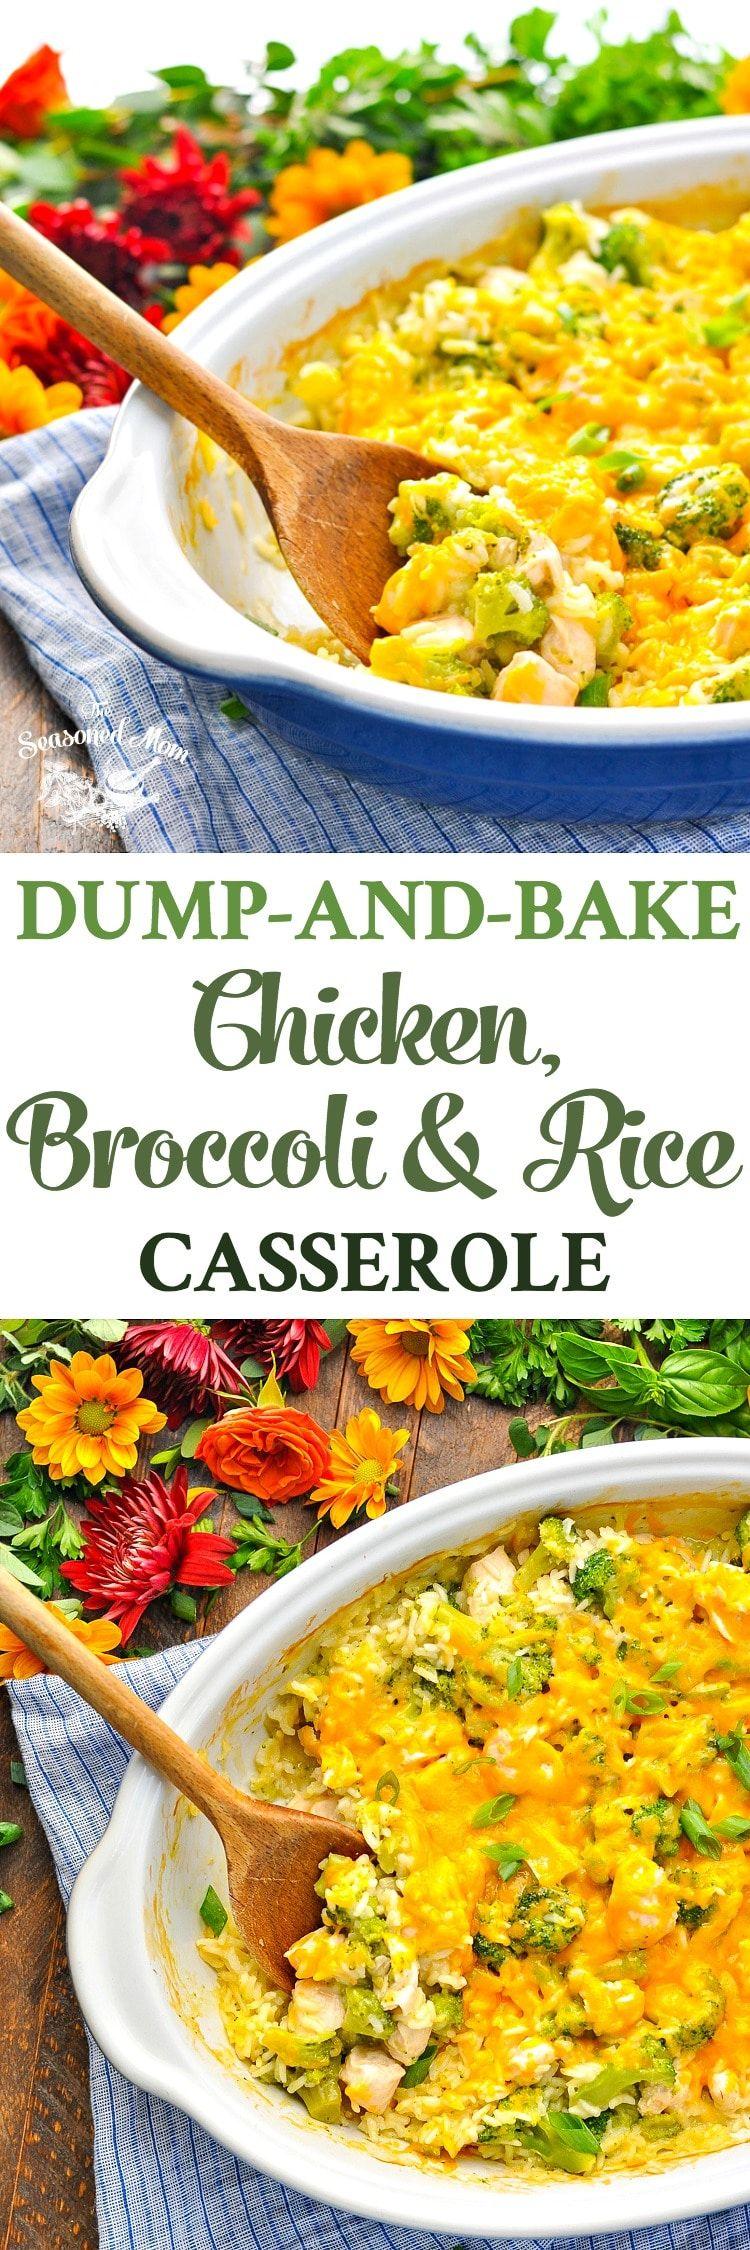 Dump-and-Bake Chicken Broccoli Rice Casserole | Recipe ...